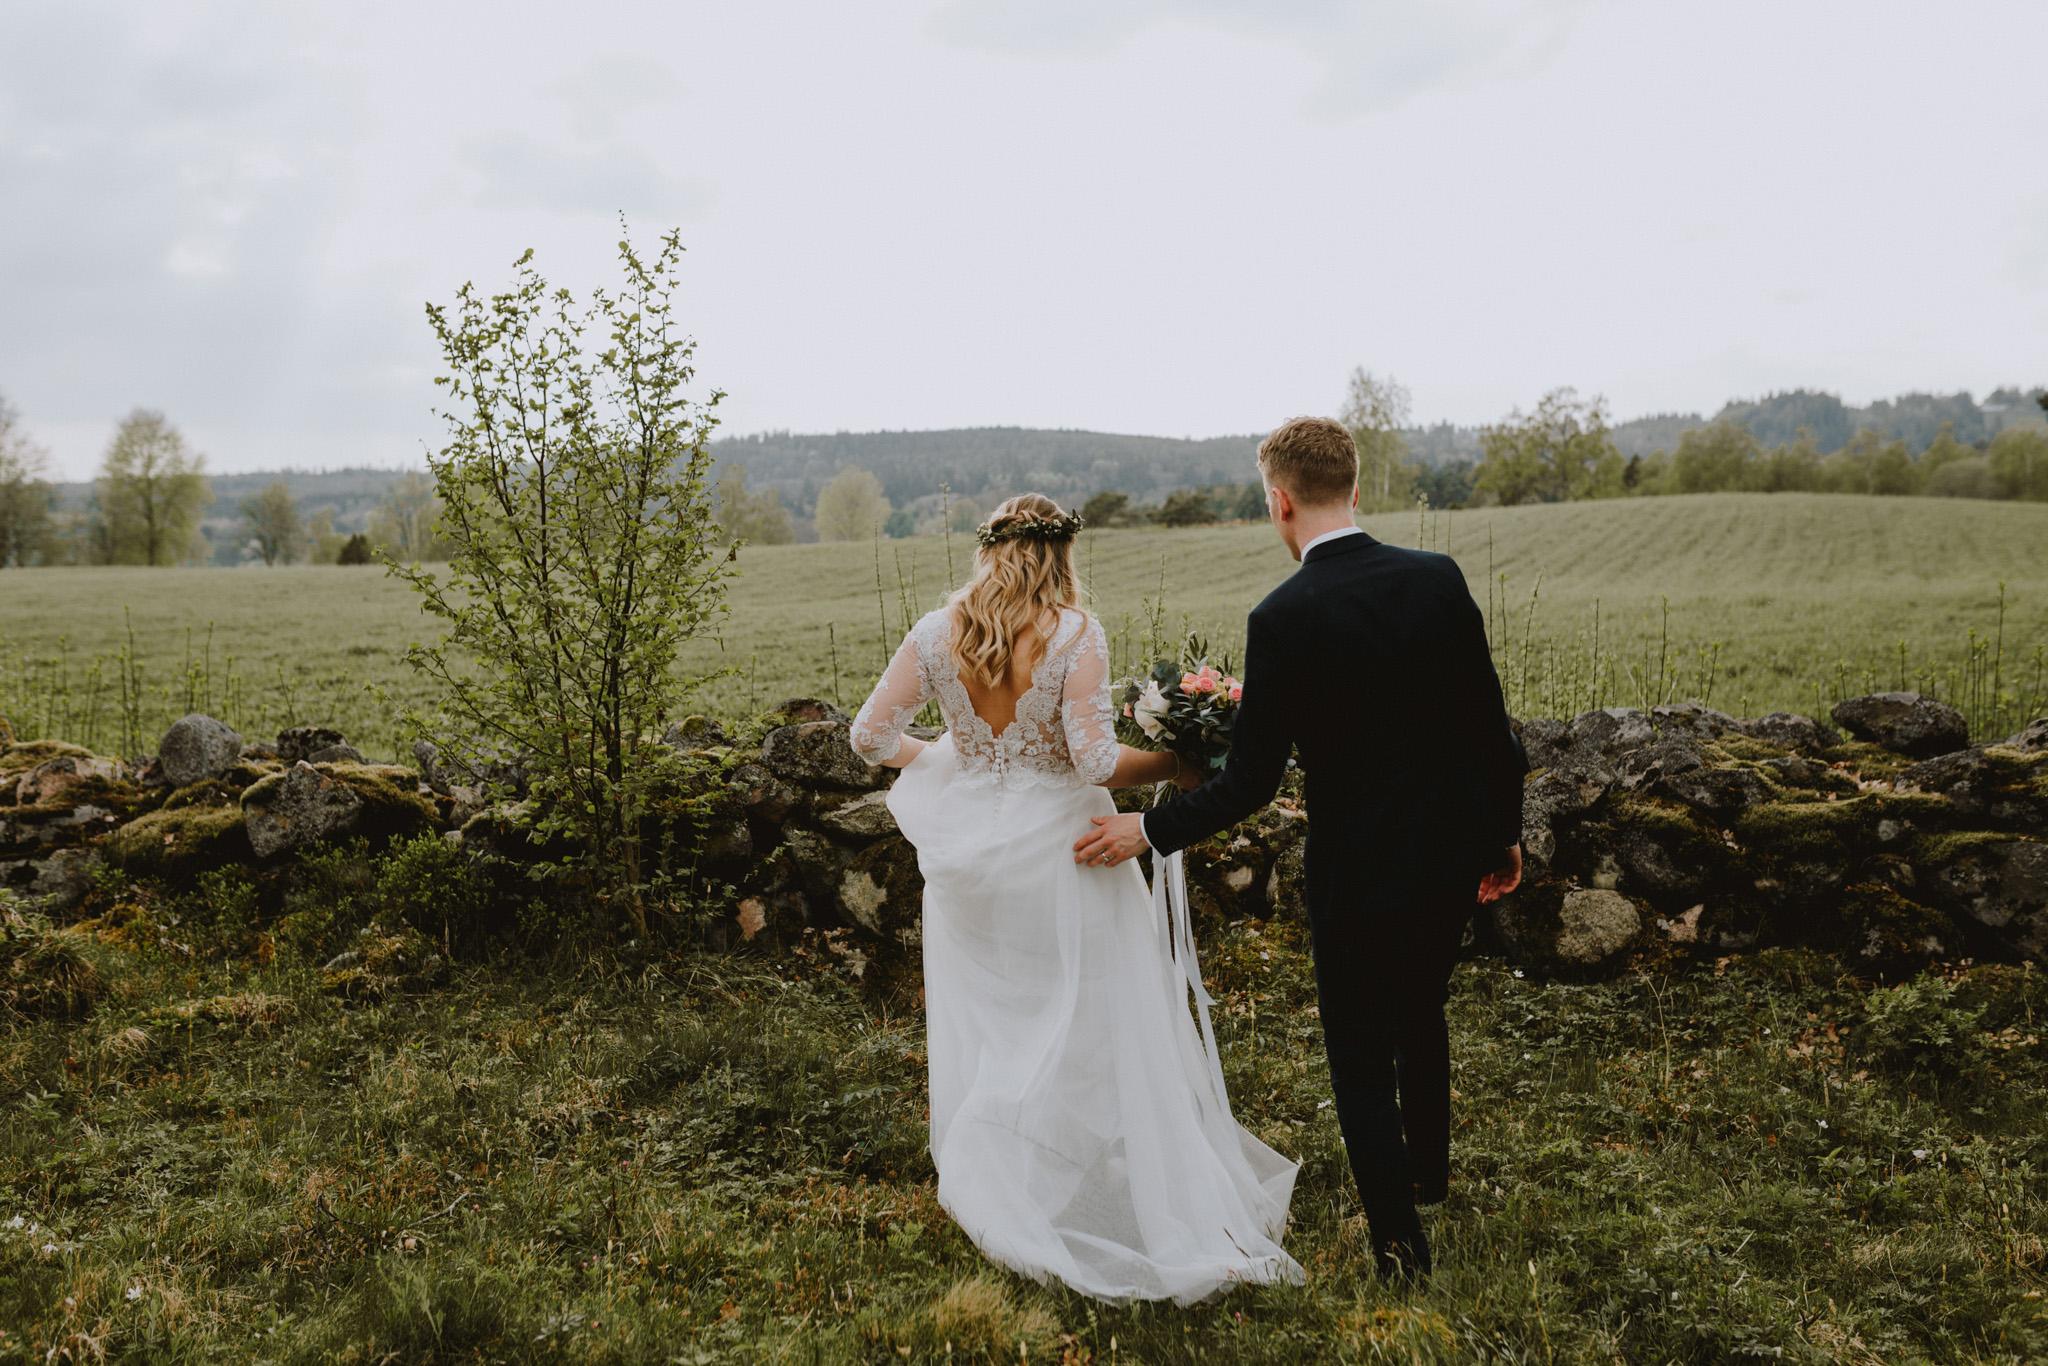 Copenhagen_Wedding_Photographer_Elopement_Photographer_Europe (7 of 100).jpg